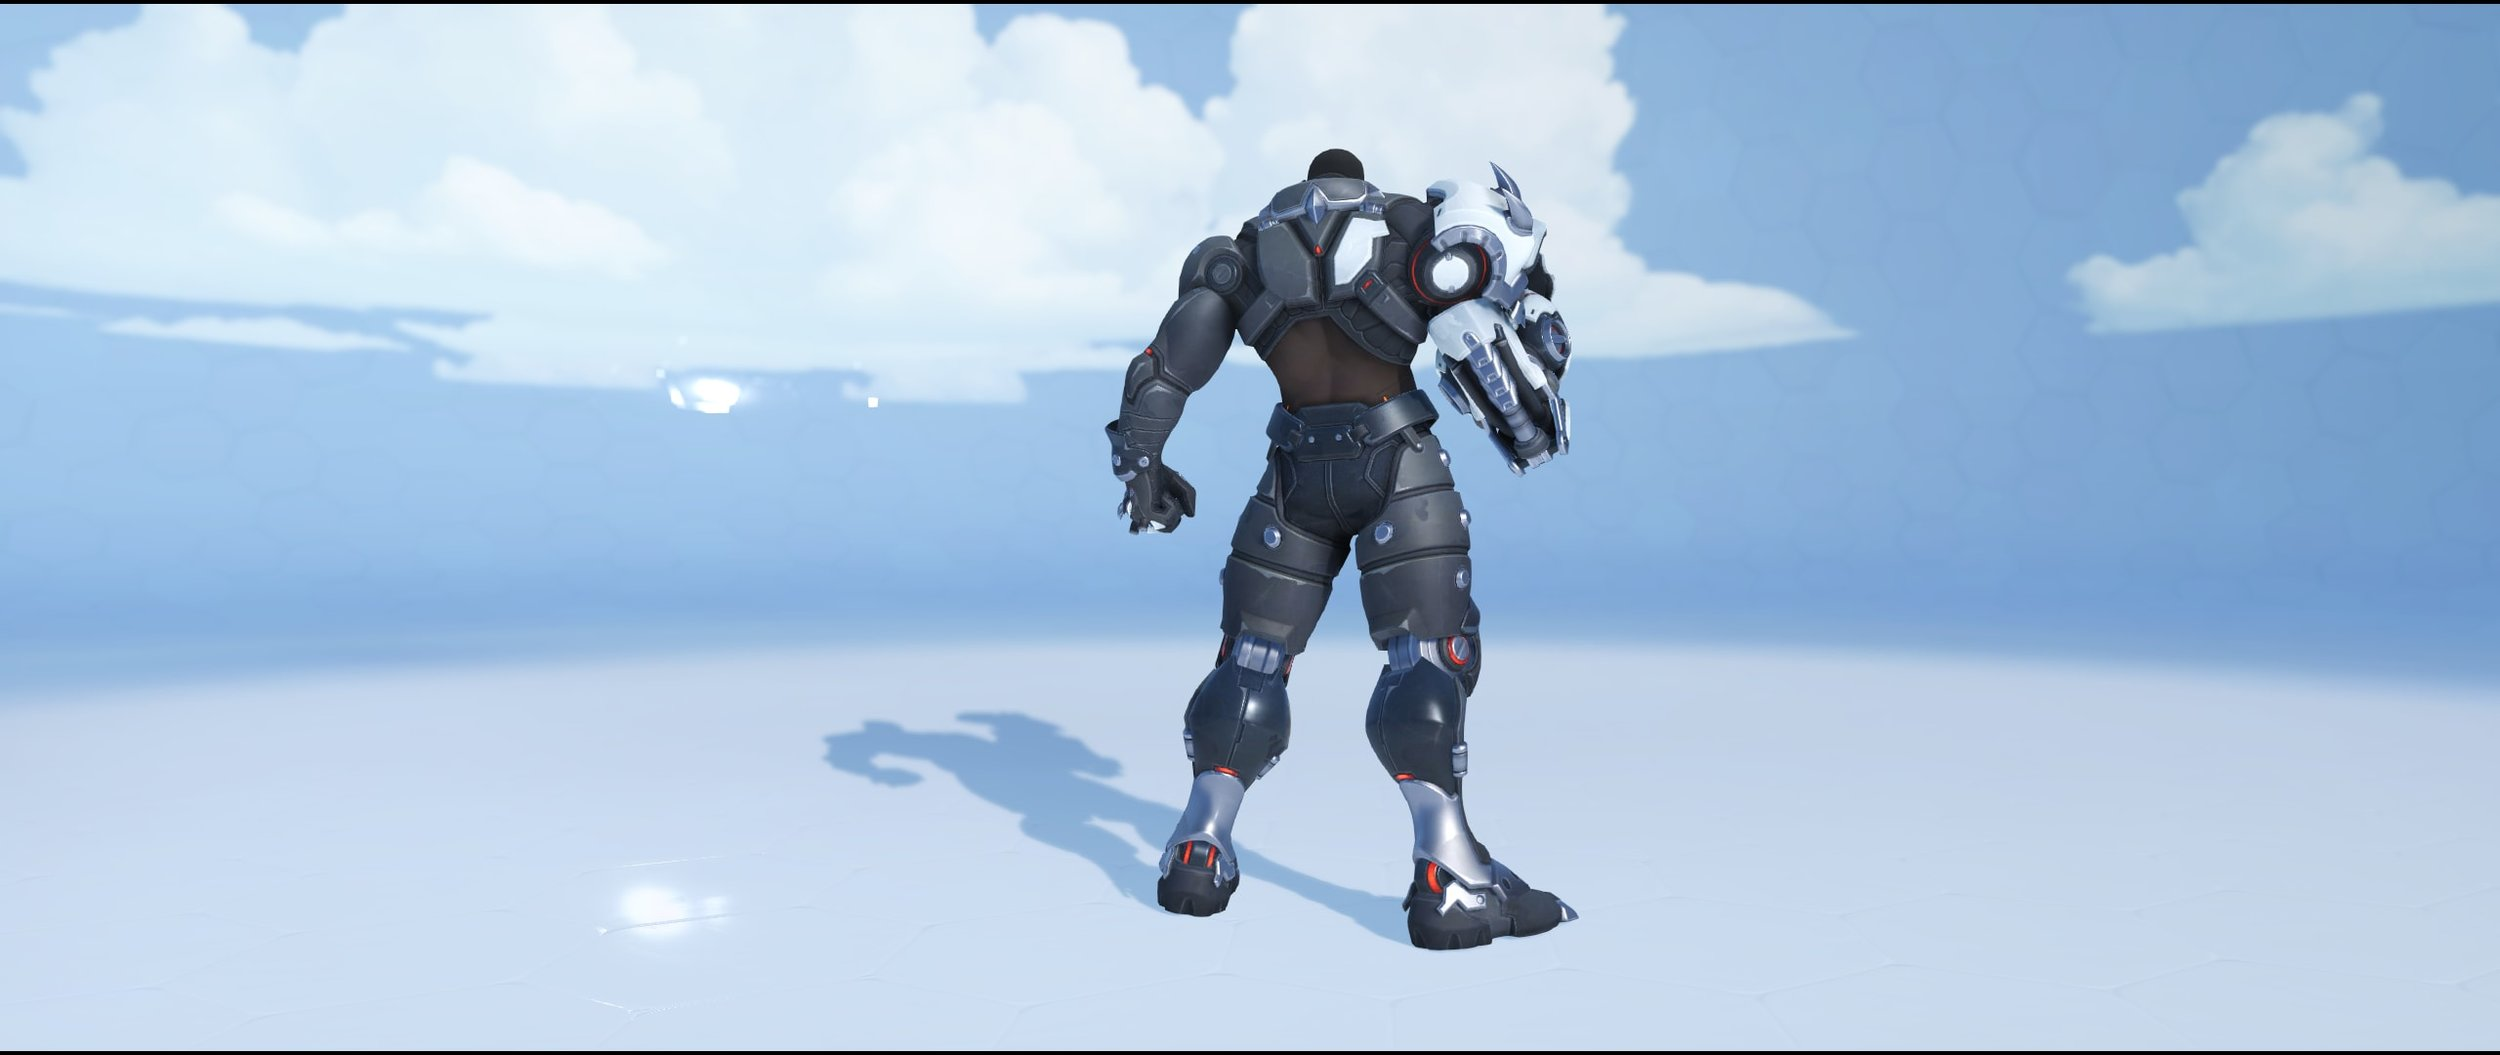 Talon back legendary Archives skin Doomfist Overwatch.jpg